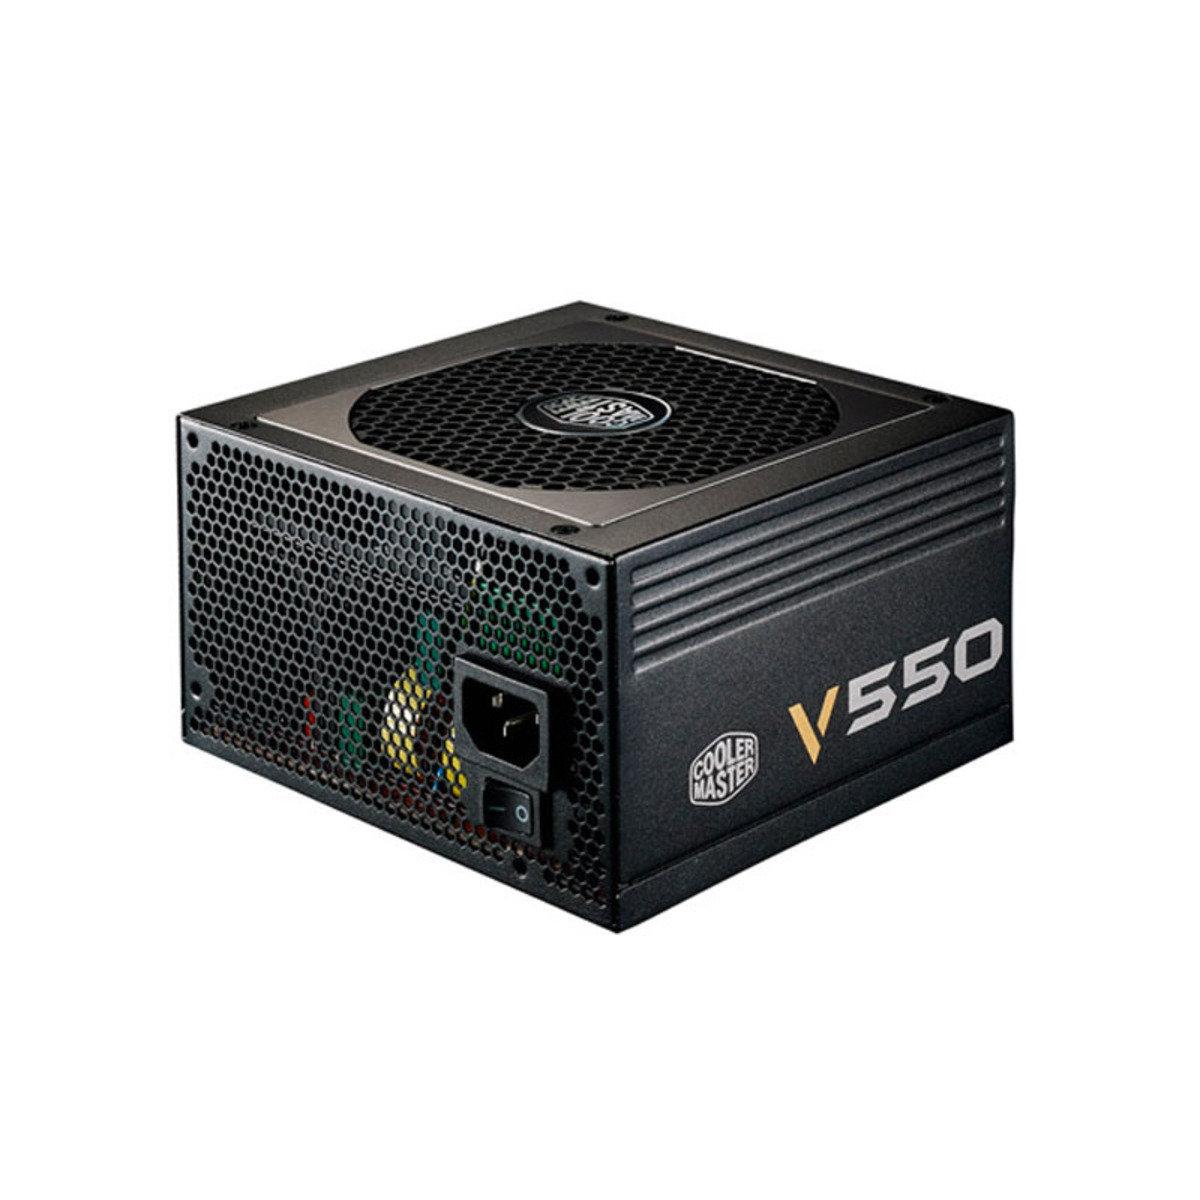 80Plus金認證 極致專家系列 V550 550w 電腦變壓器